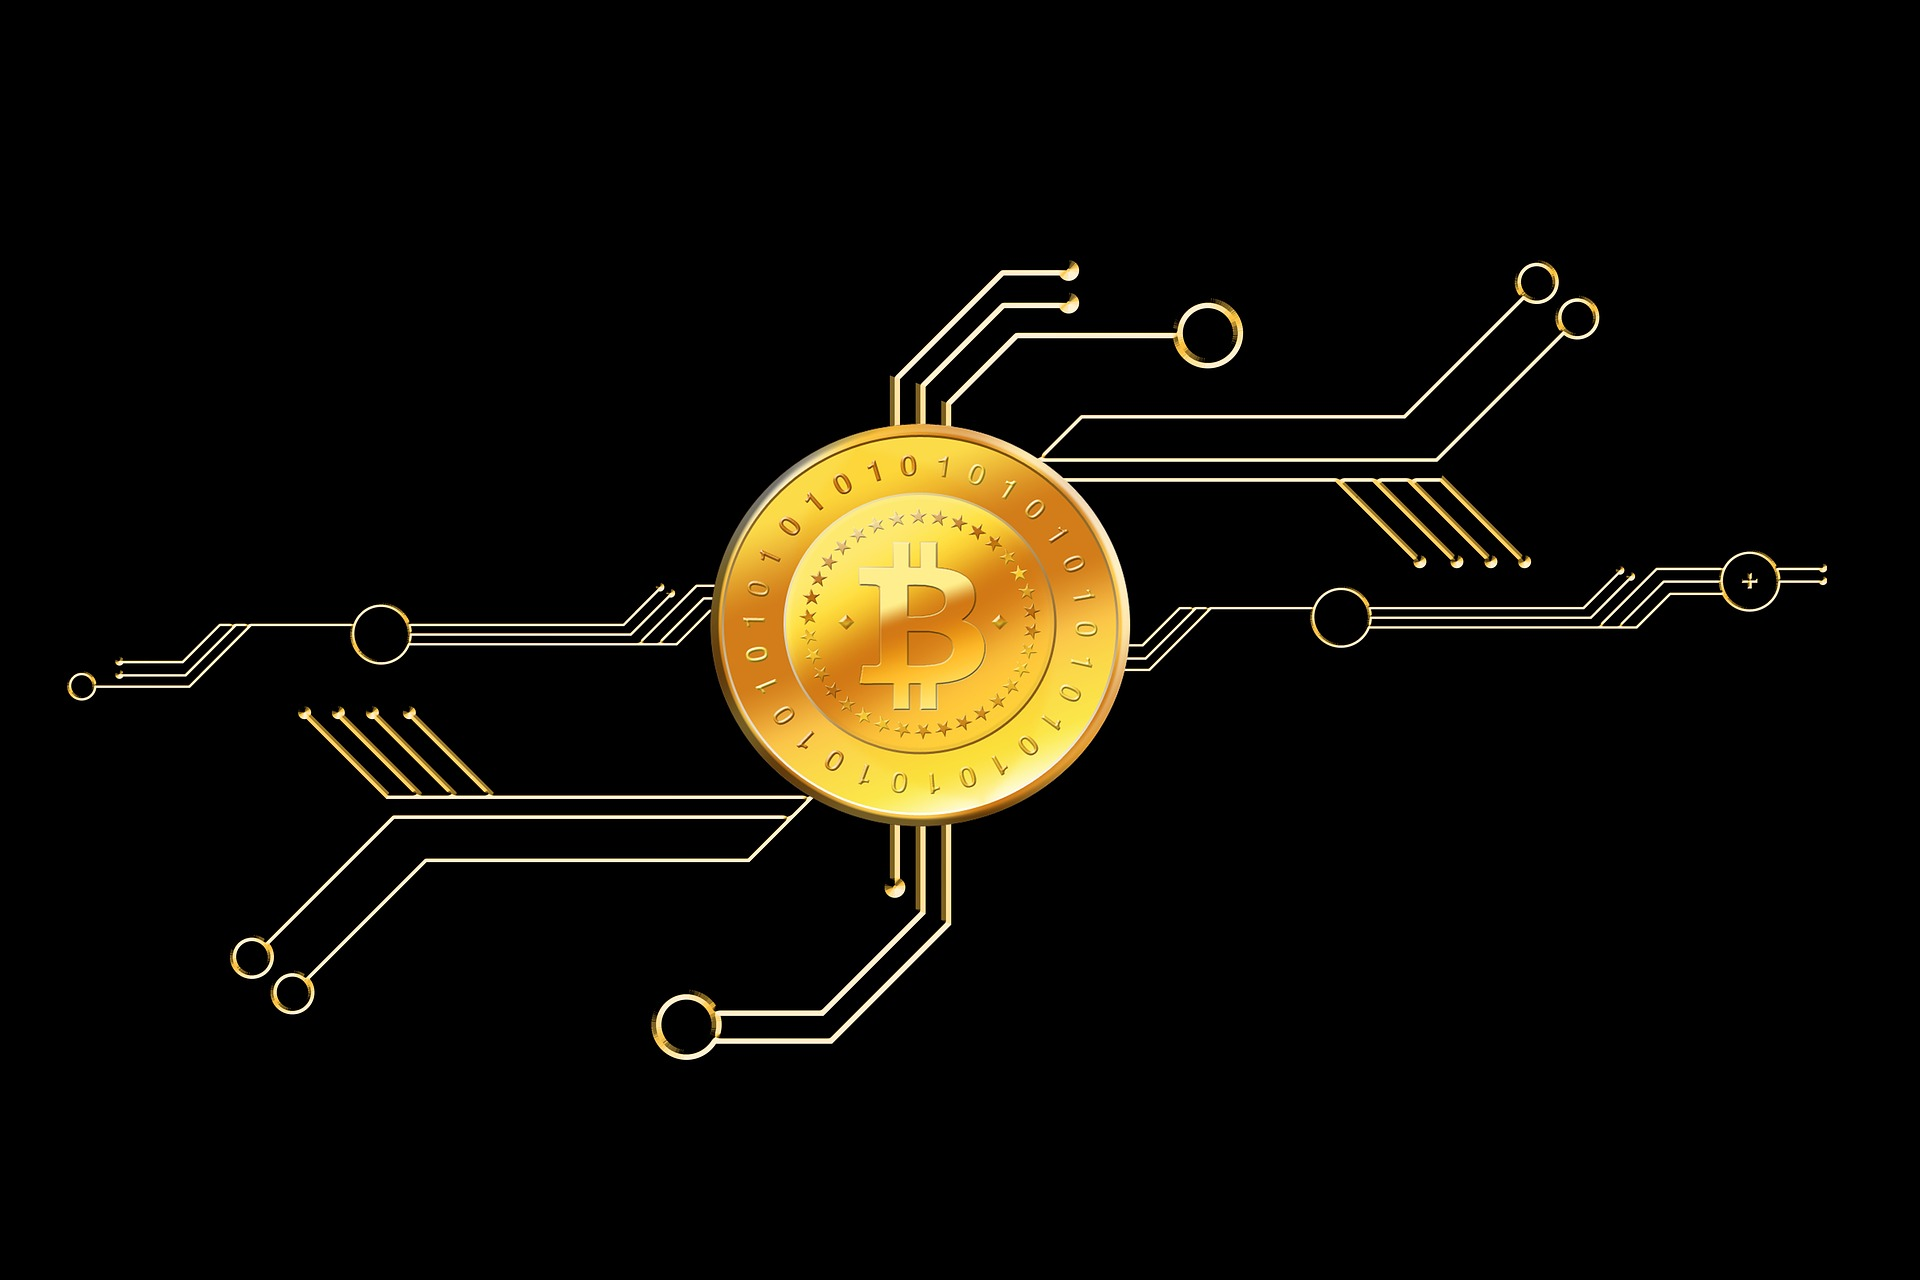 Vartisť Bitcoin dosjagla novogo rekordu